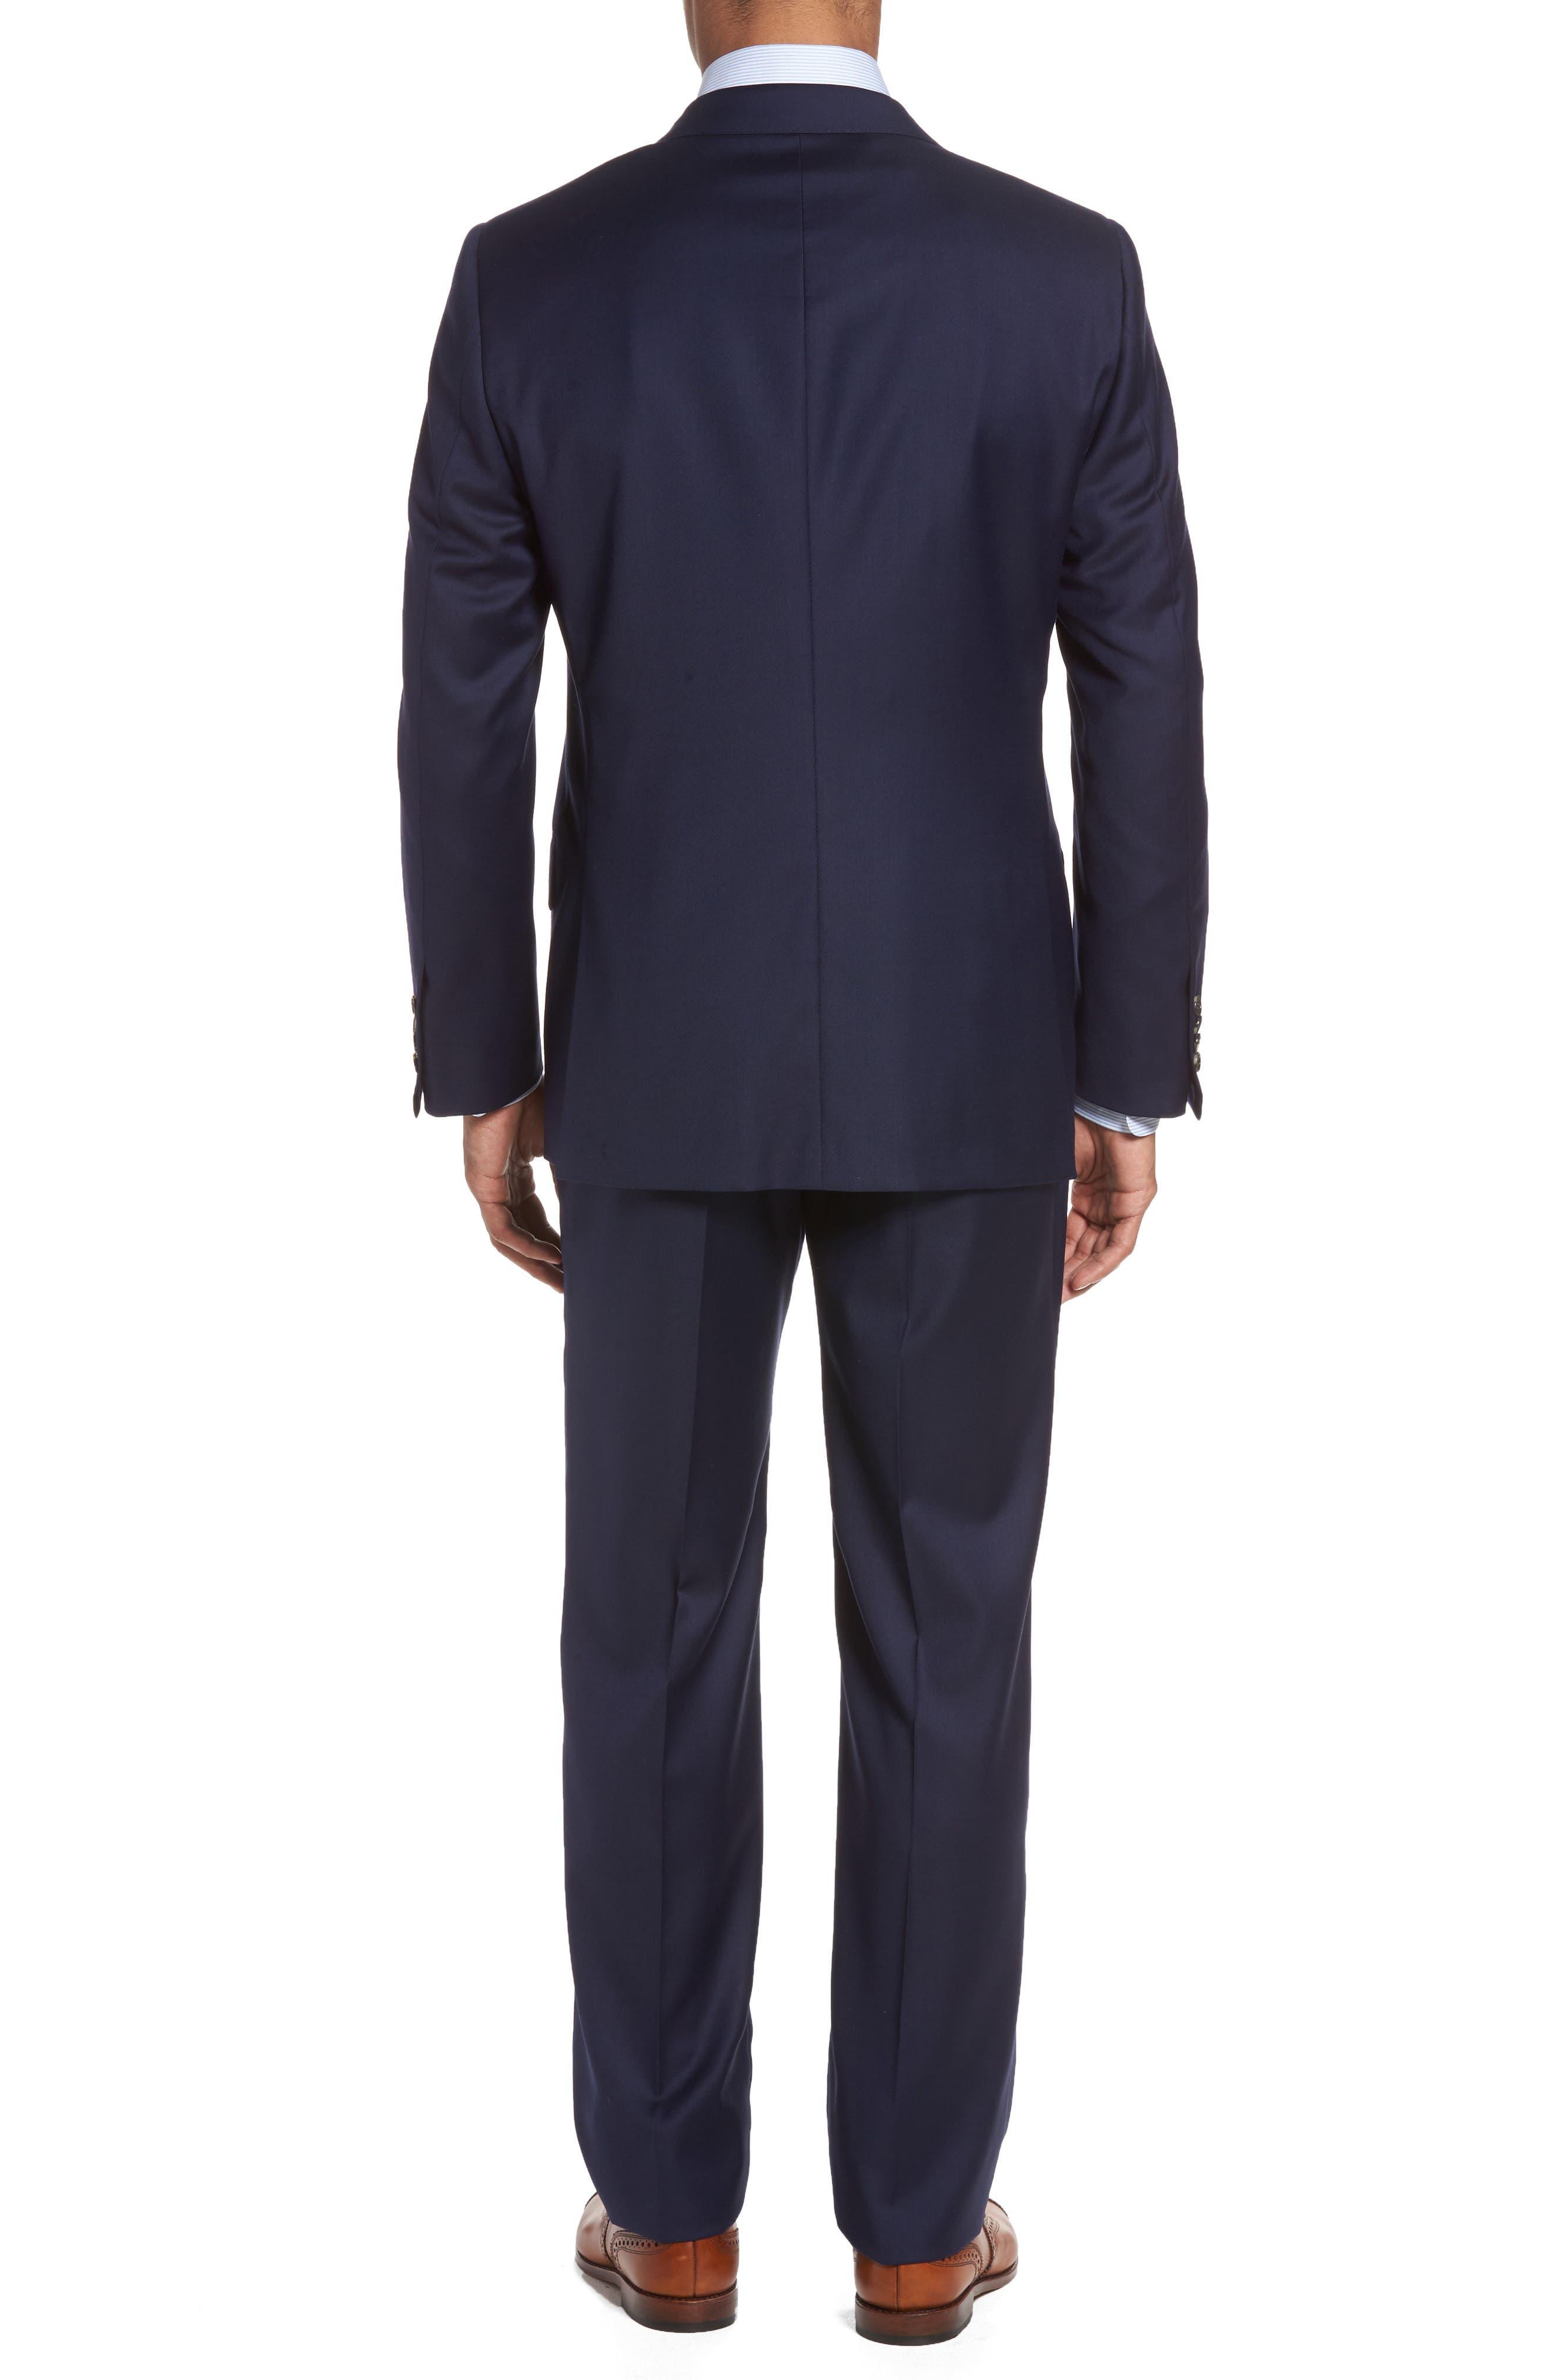 HICKEY FREEMAN, Classic B Fit Loro Piana Wool Suit, Alternate thumbnail 2, color, NAVY